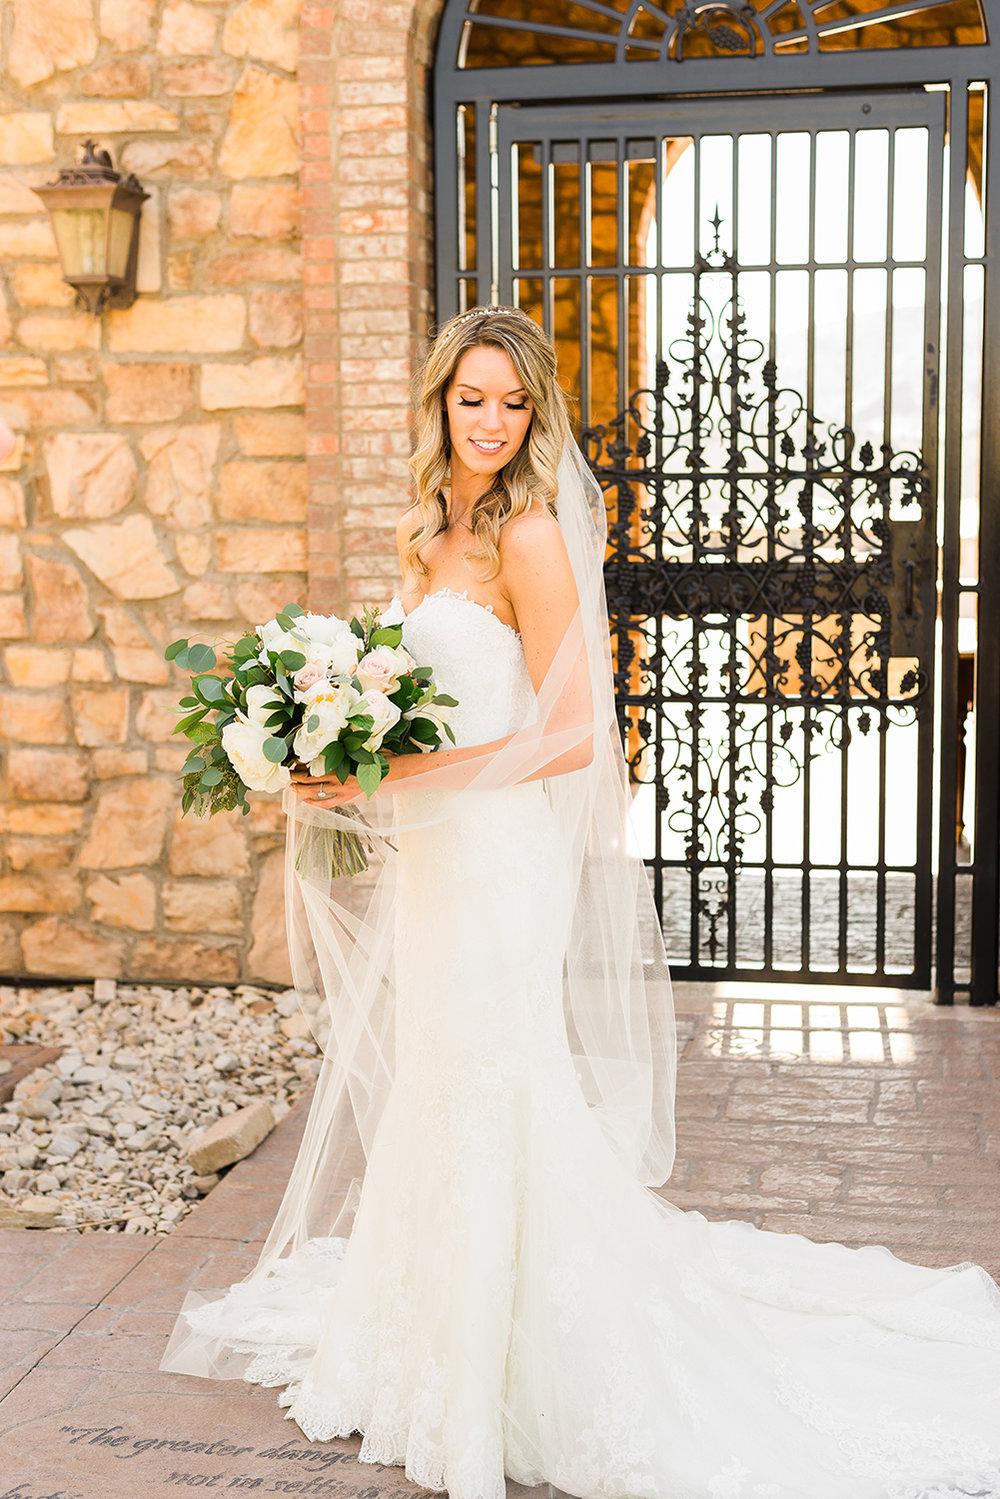 The-Retreat-At-Solterra-Wedding-Denver-Wedding-Photographer-16.jpg